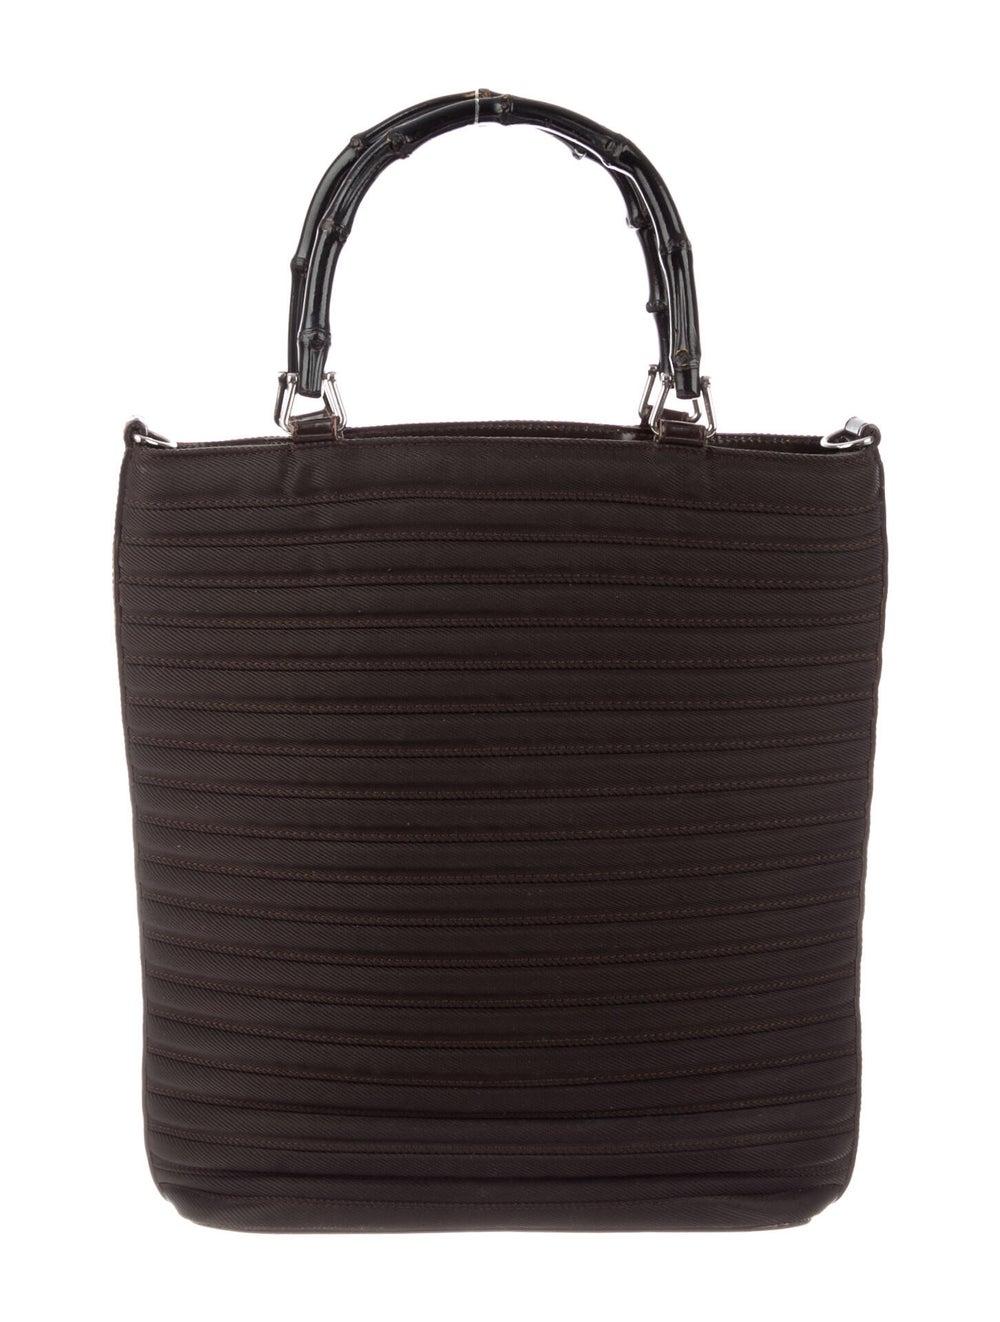 Gucci Vintage Diana Nylon Bamboo Handle Bag Brown - image 1